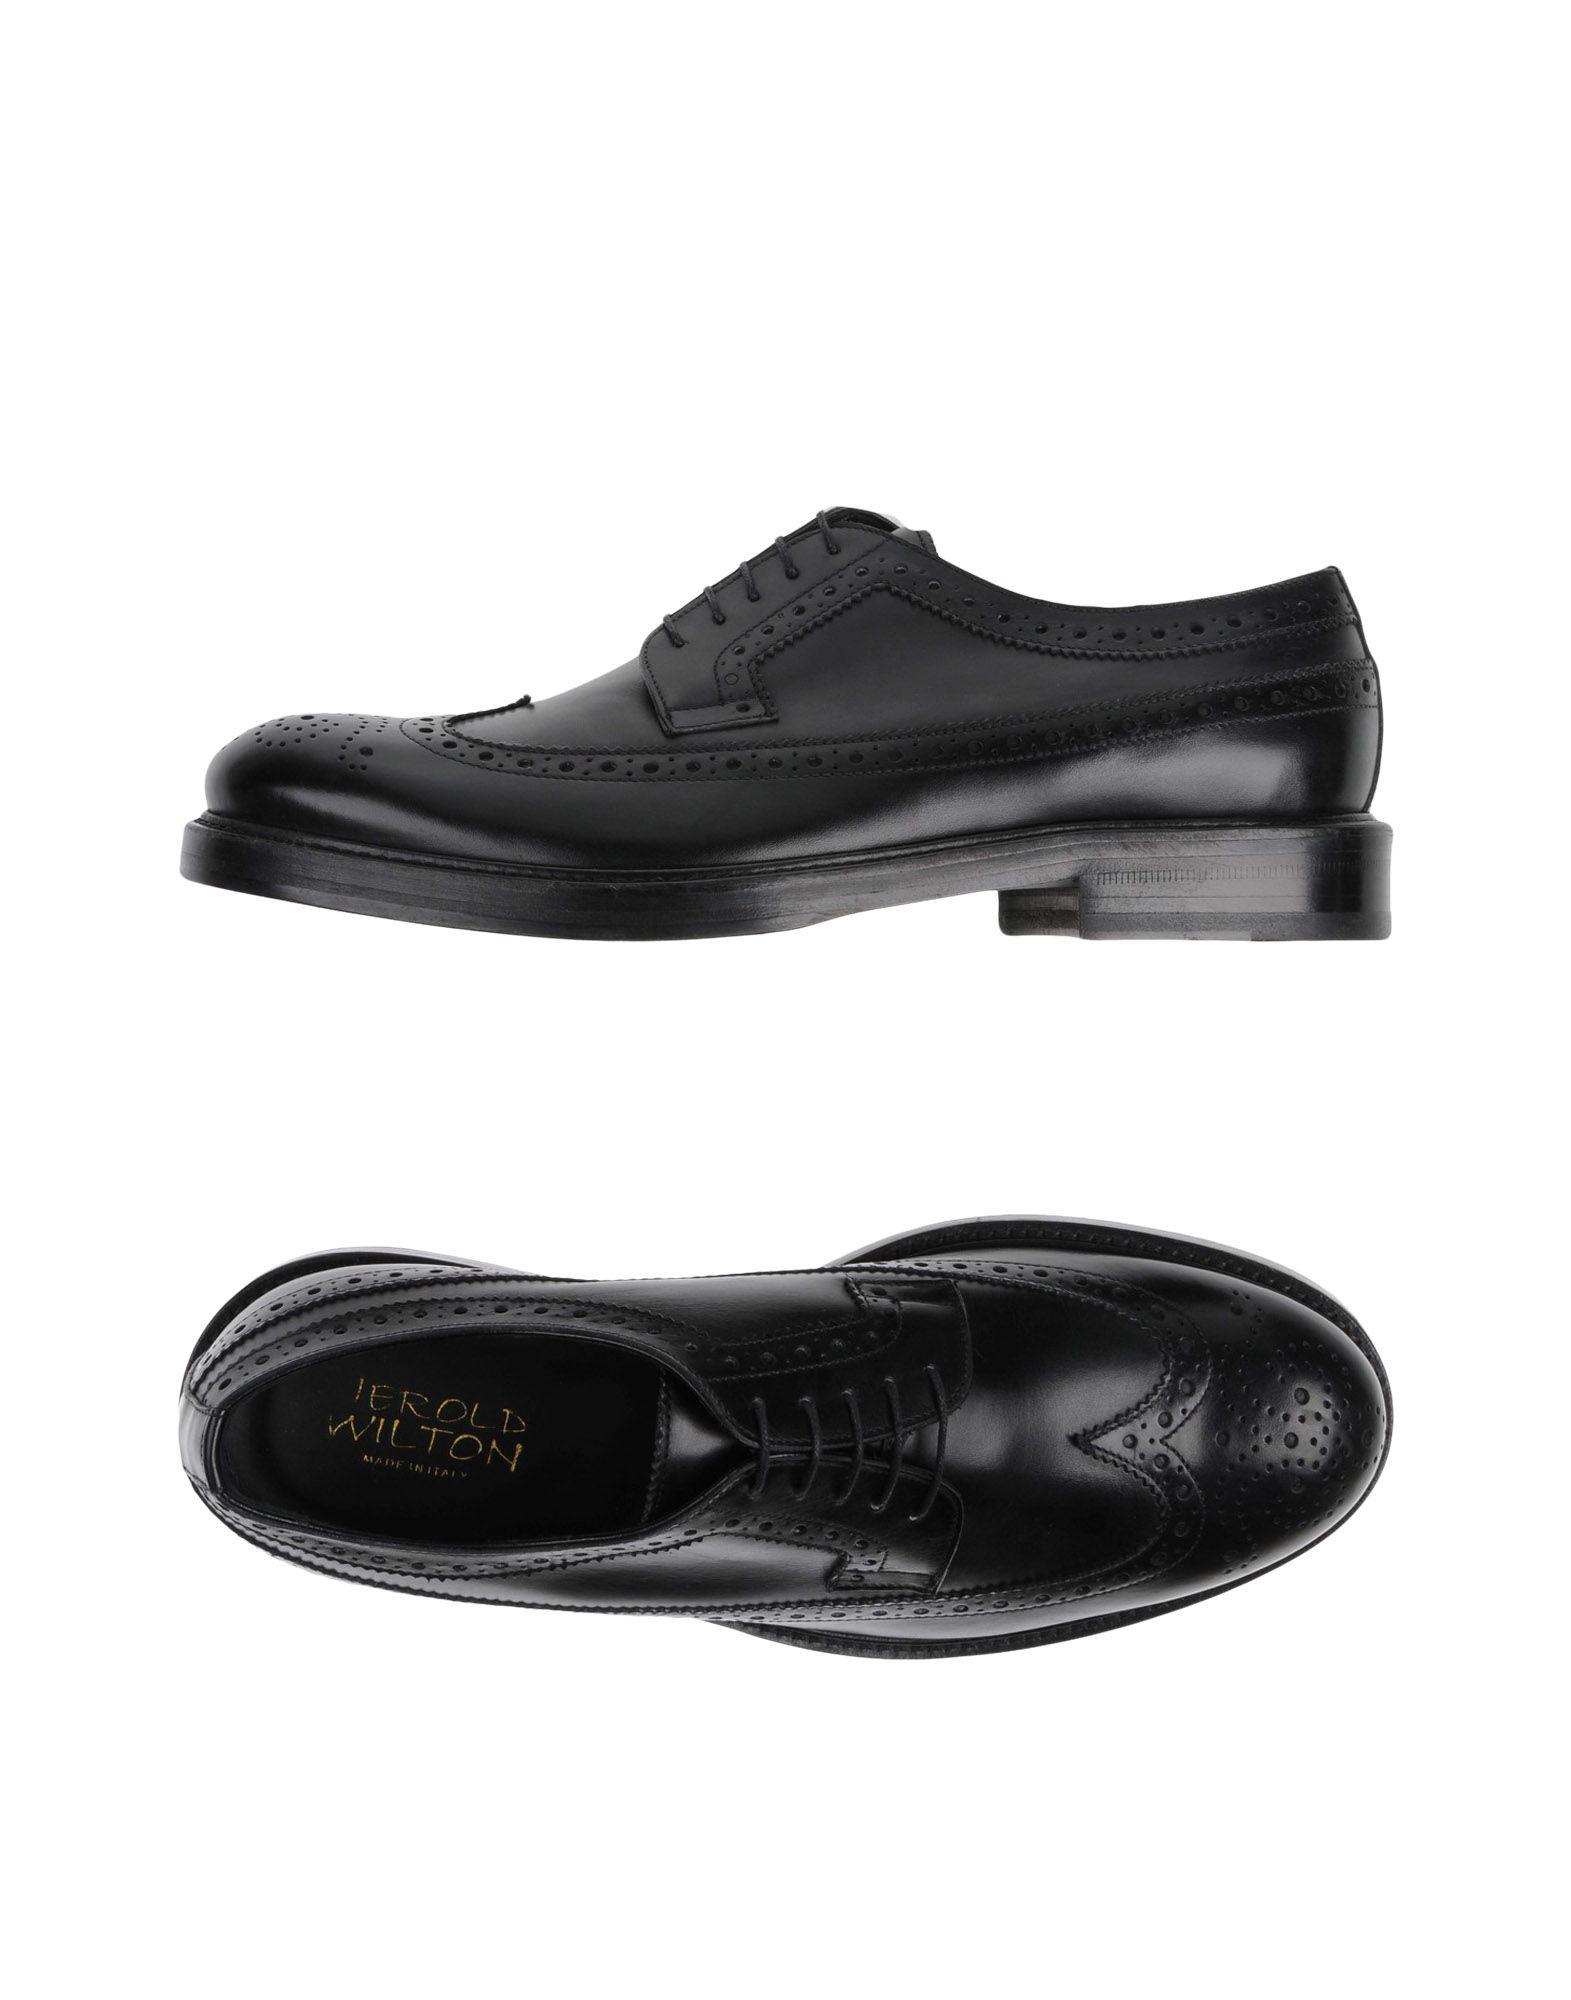 Rabatt echte Schuhe Schnürschuhe Jerold Wilton Schnürschuhe Schuhe Herren 11249127BL 577837